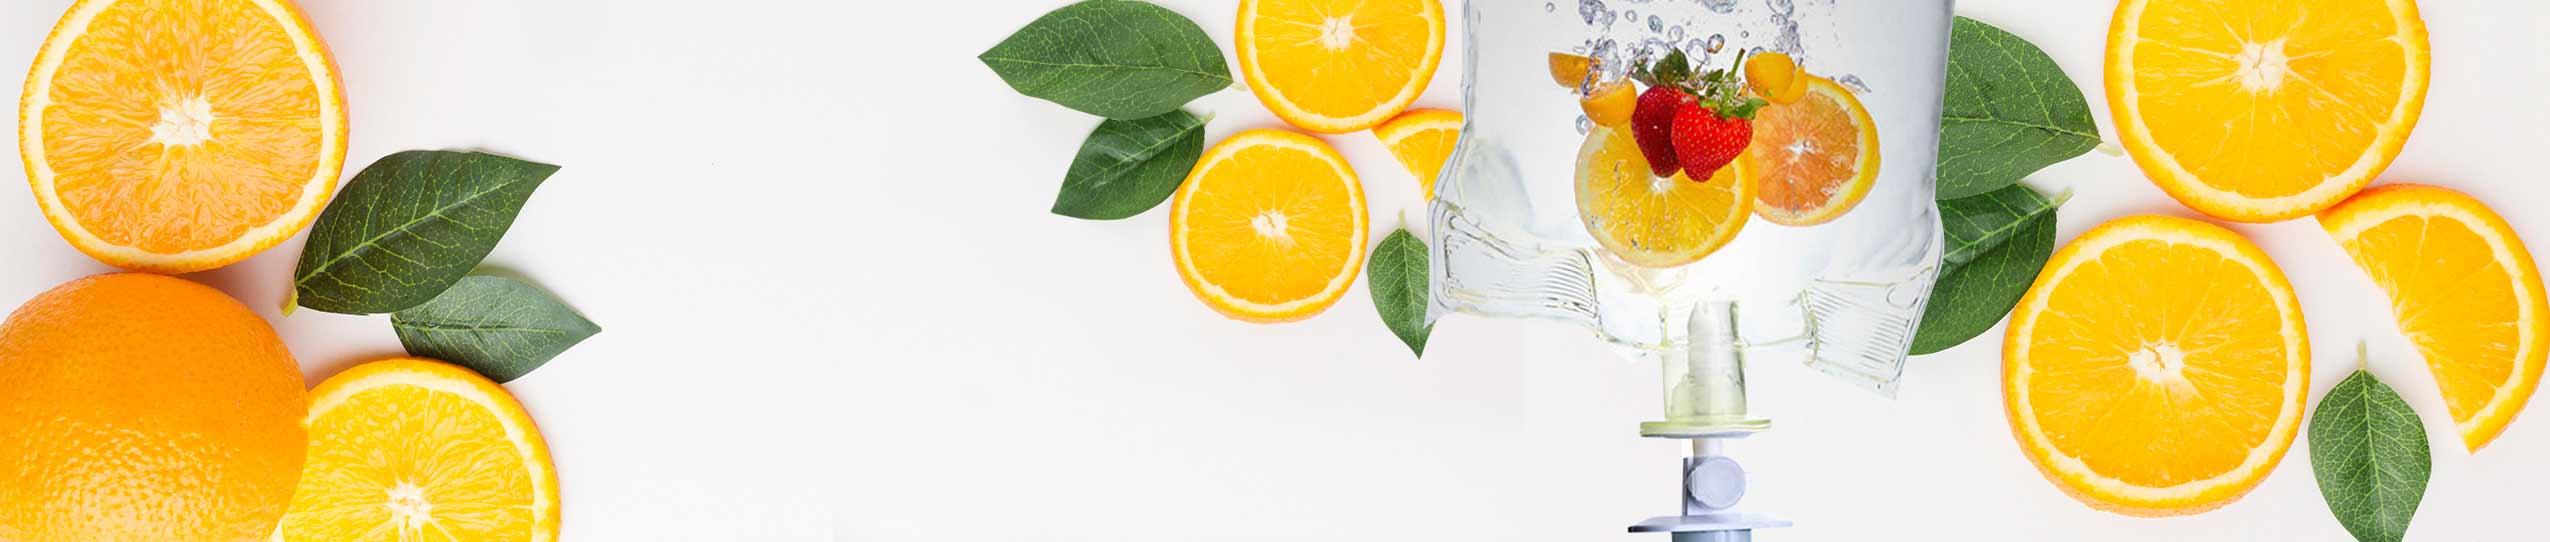 vitamina c inyectable